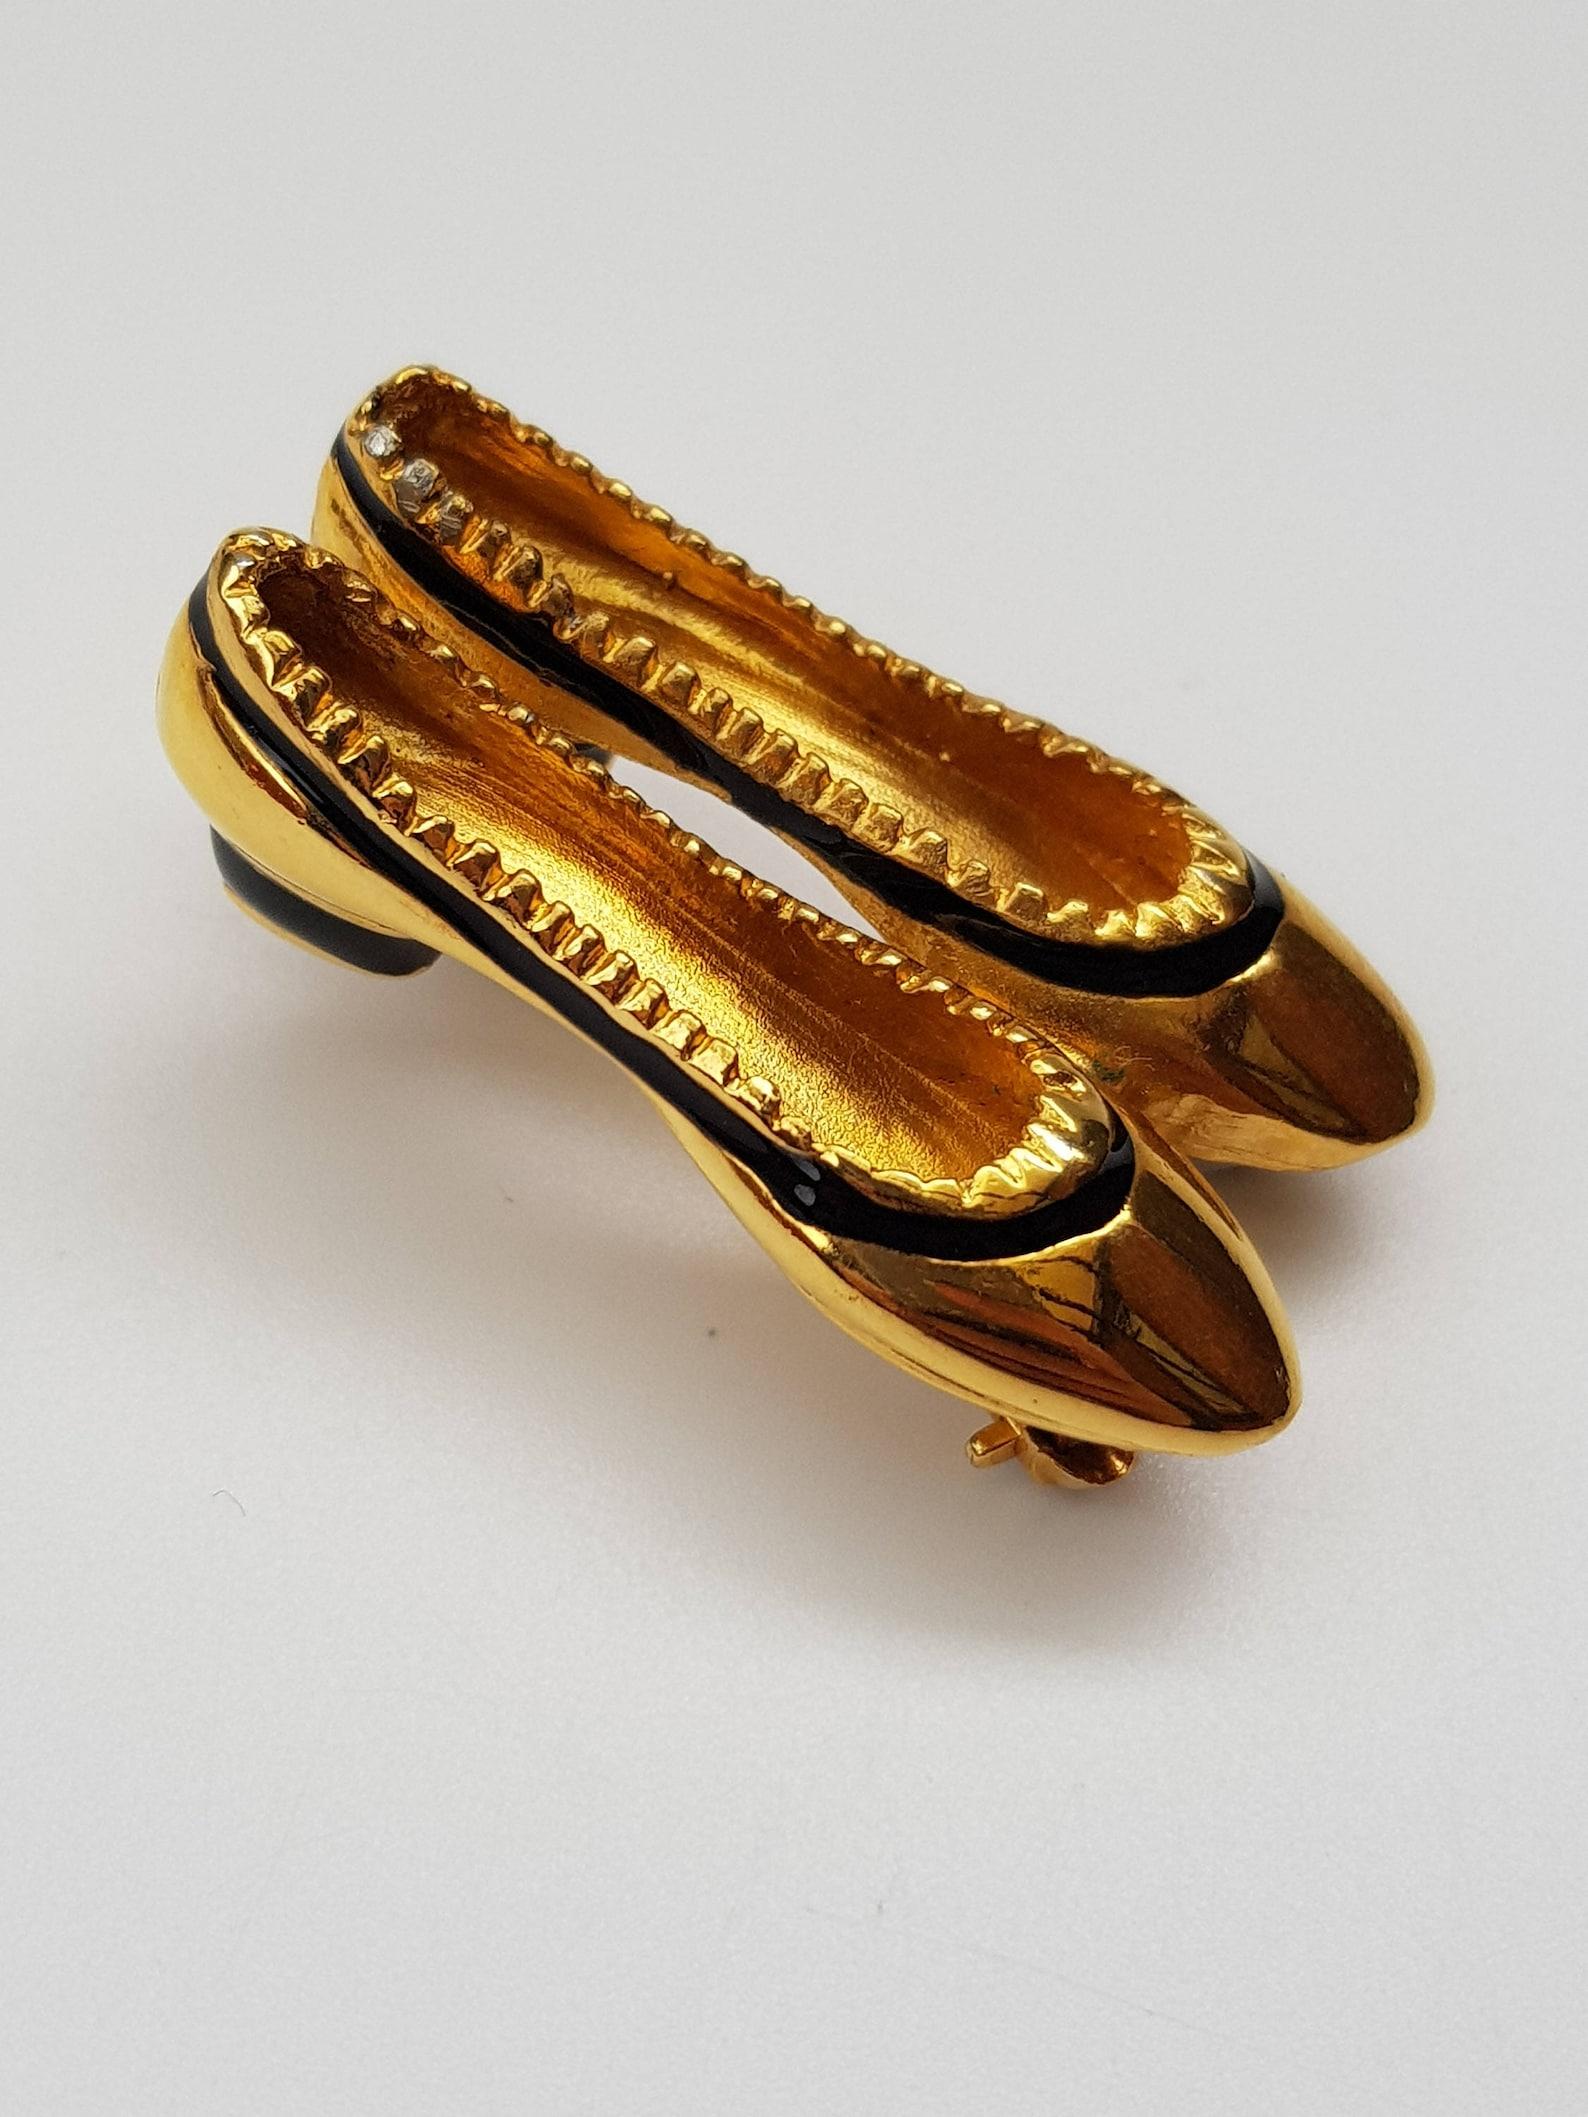 sale! ferragamo brooch. salvatore ferragamo vintage ballet style shoes brooch. italian designer jewellery.